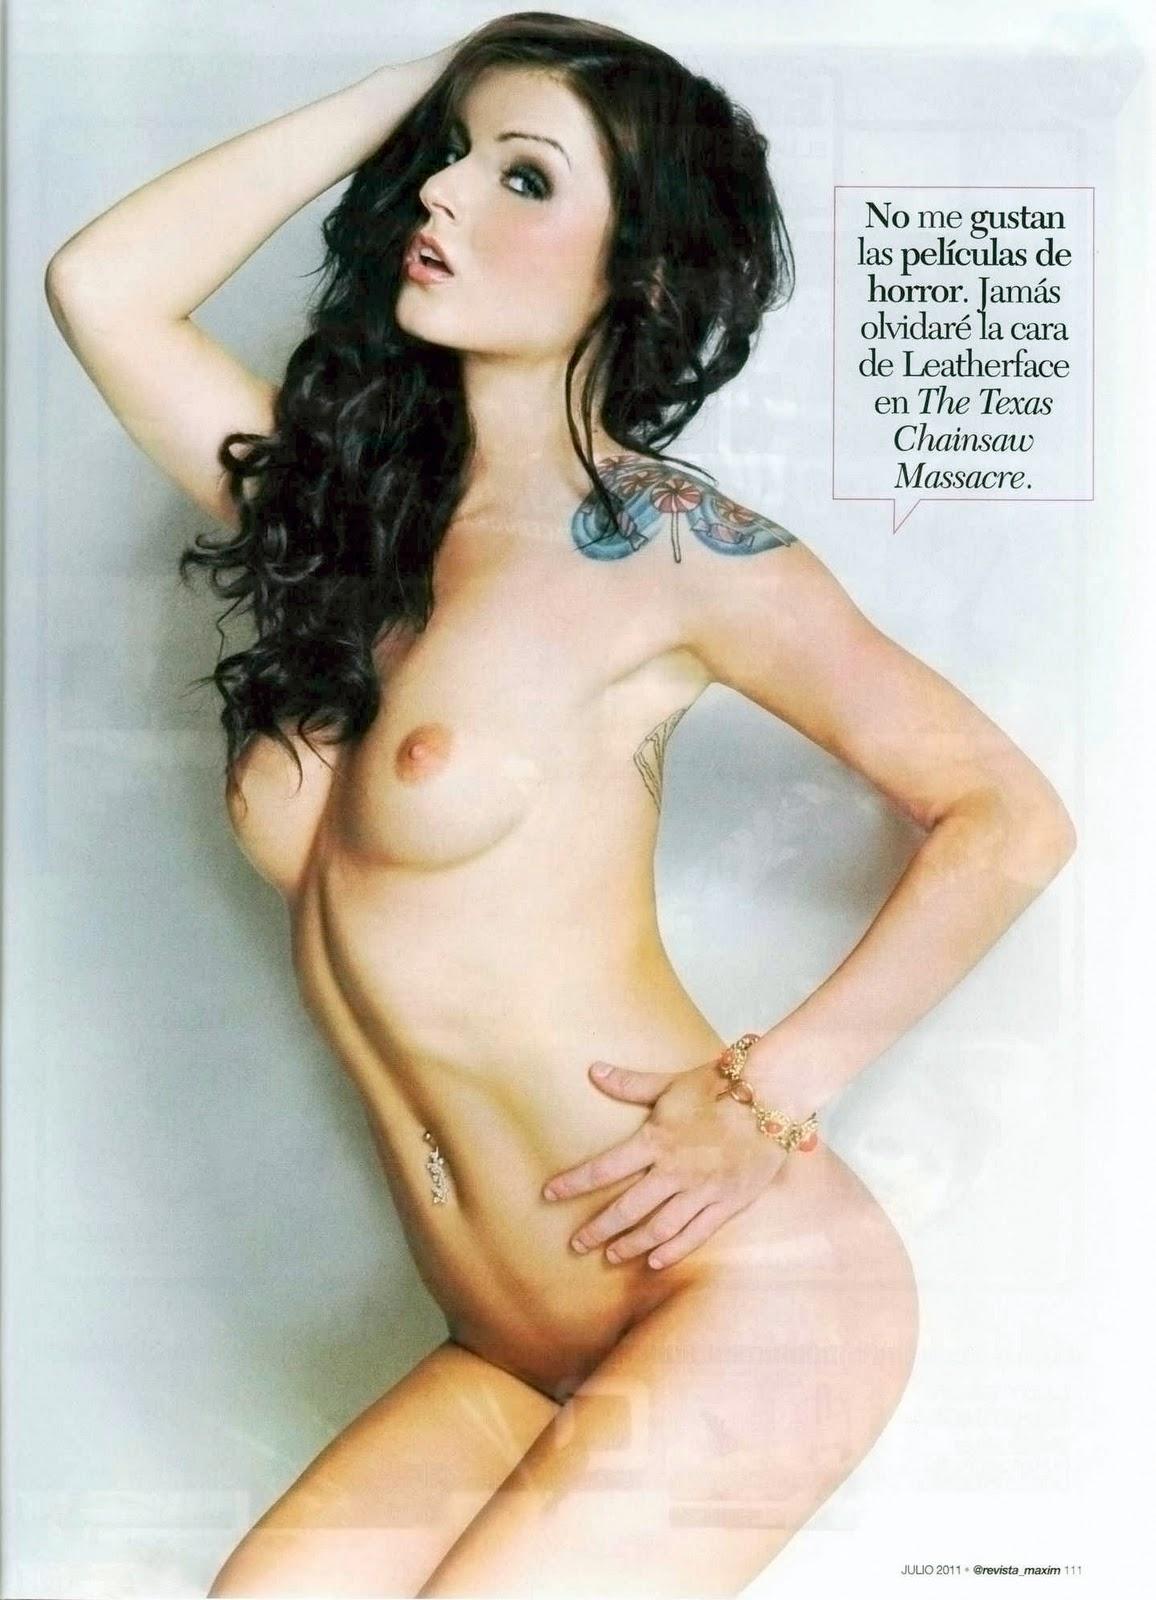 Amusing Maxim mayra veronica nude interesting message